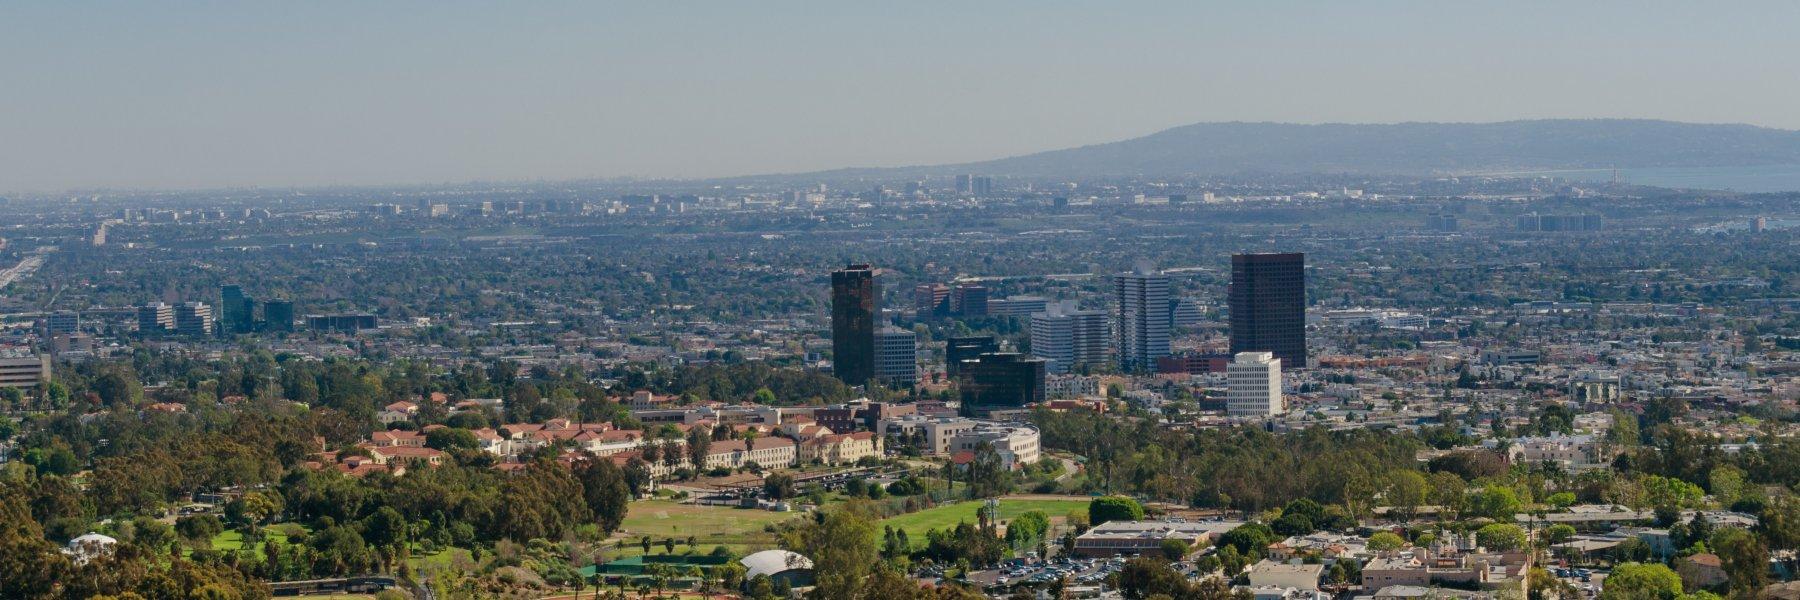 Bel Air is a community of homes in Los Angeles California